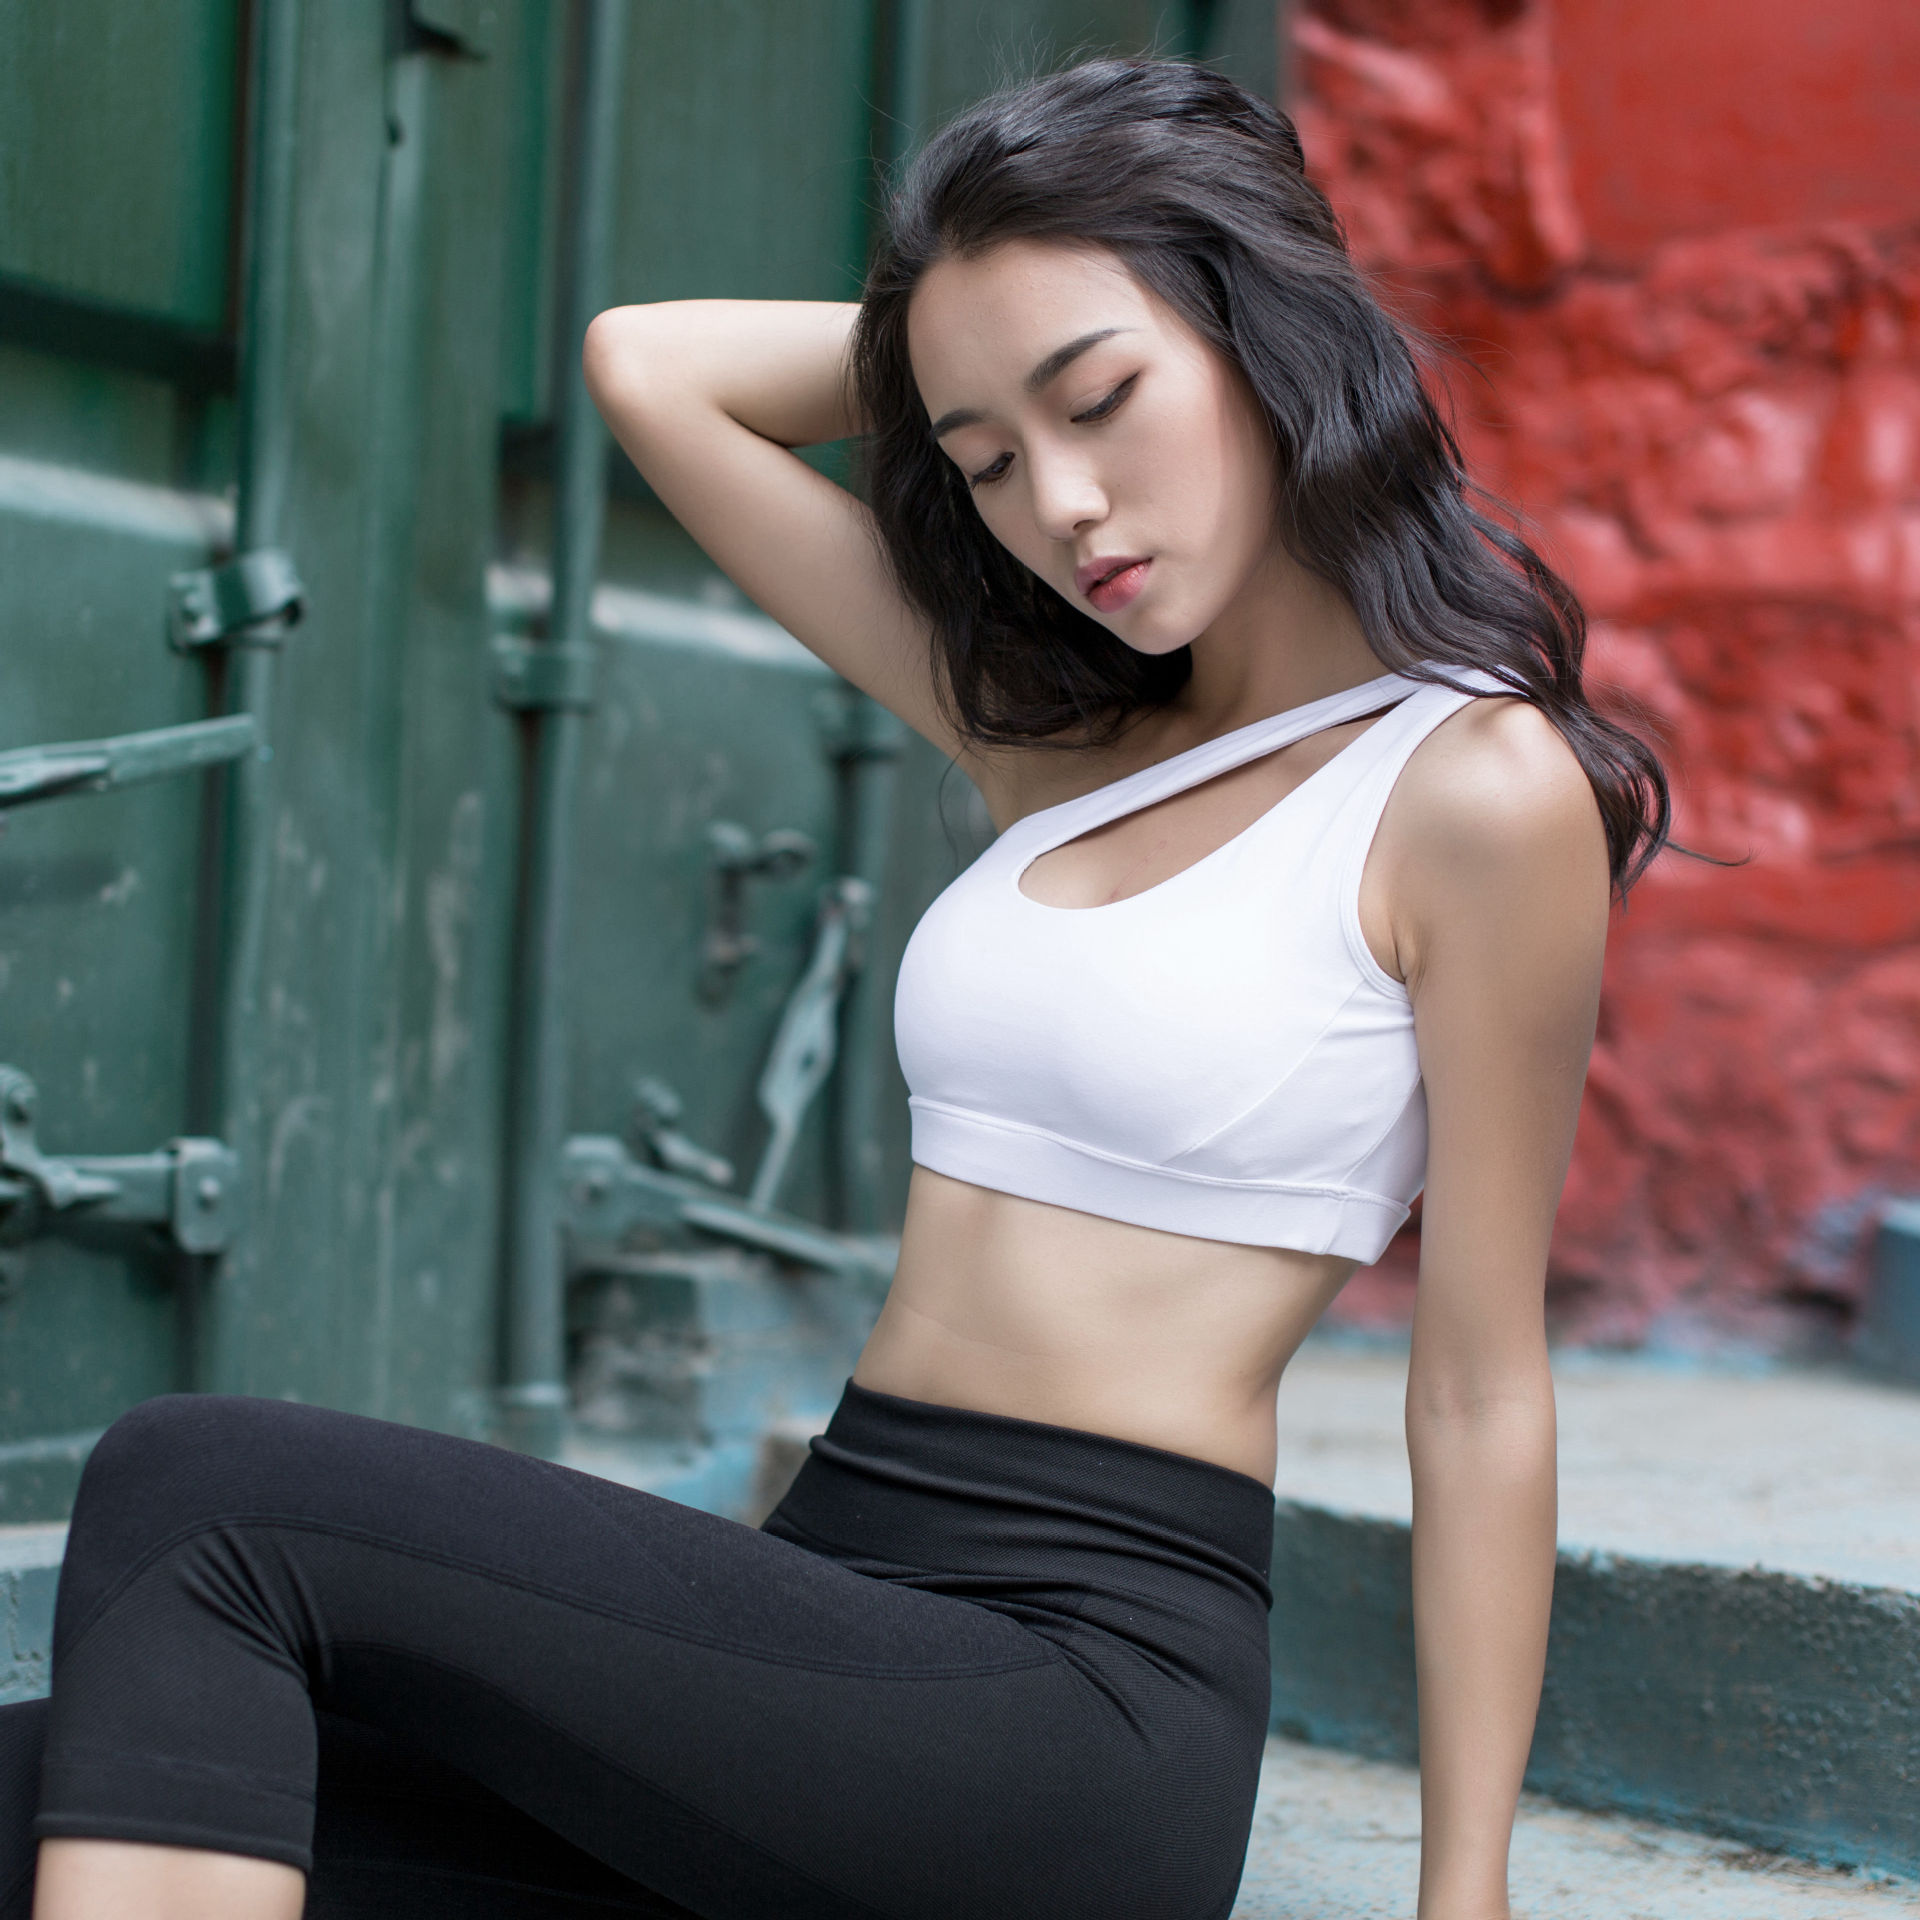 jogging-women-sexy-hot-wife-moan-black-stud